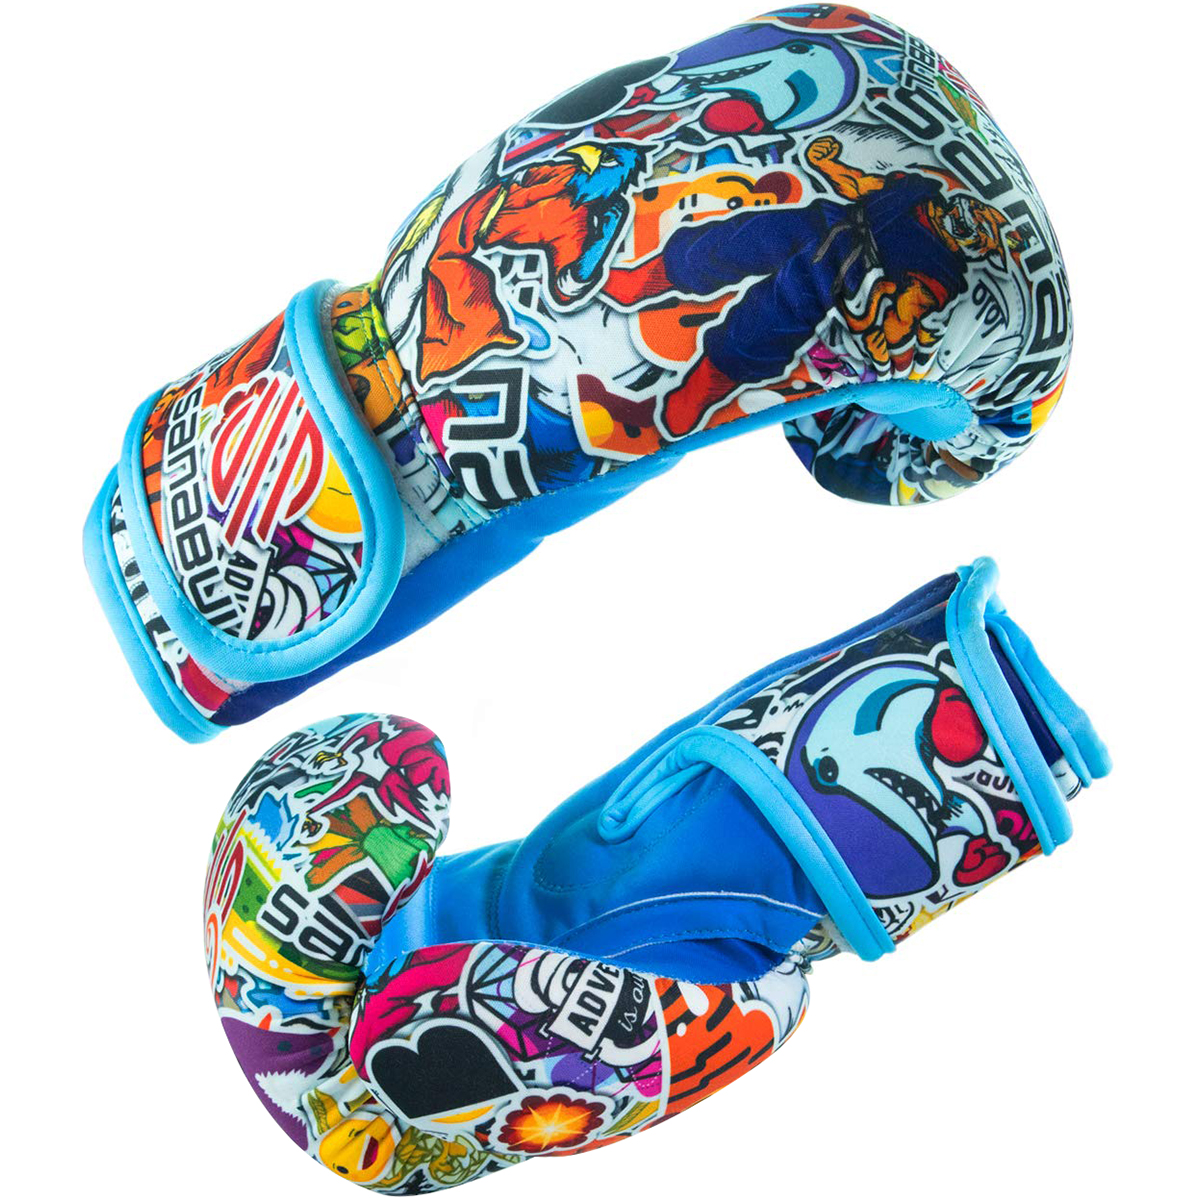 Sanabul Sticker Bomb Kids Boxing Gloves